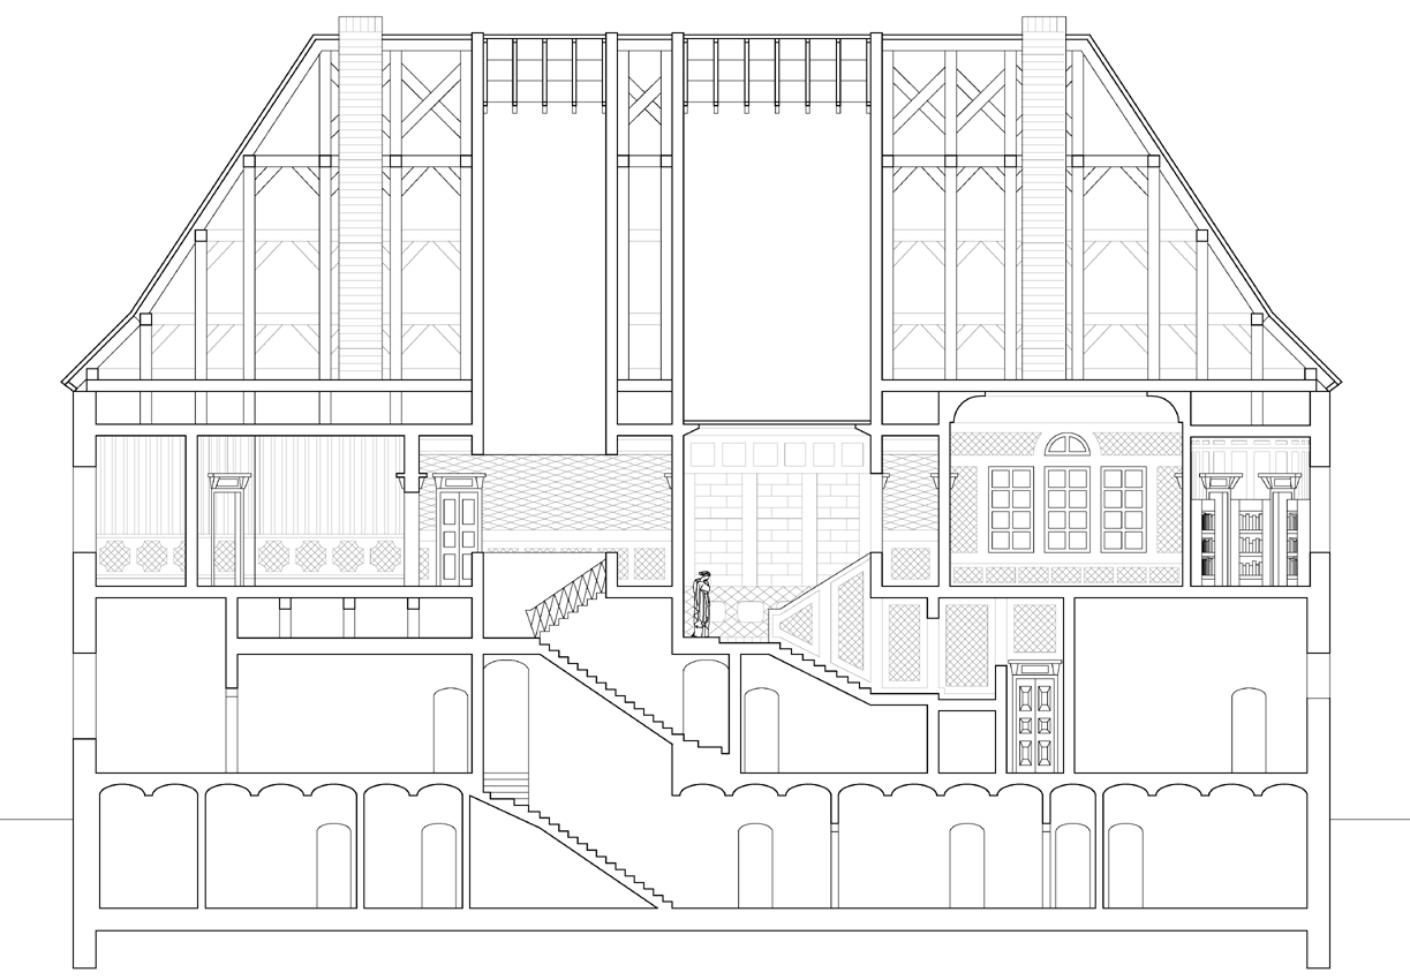 Reconstruction of Adalbert Stifter's Rosenhaus, Uwe Bresan, Stylepark